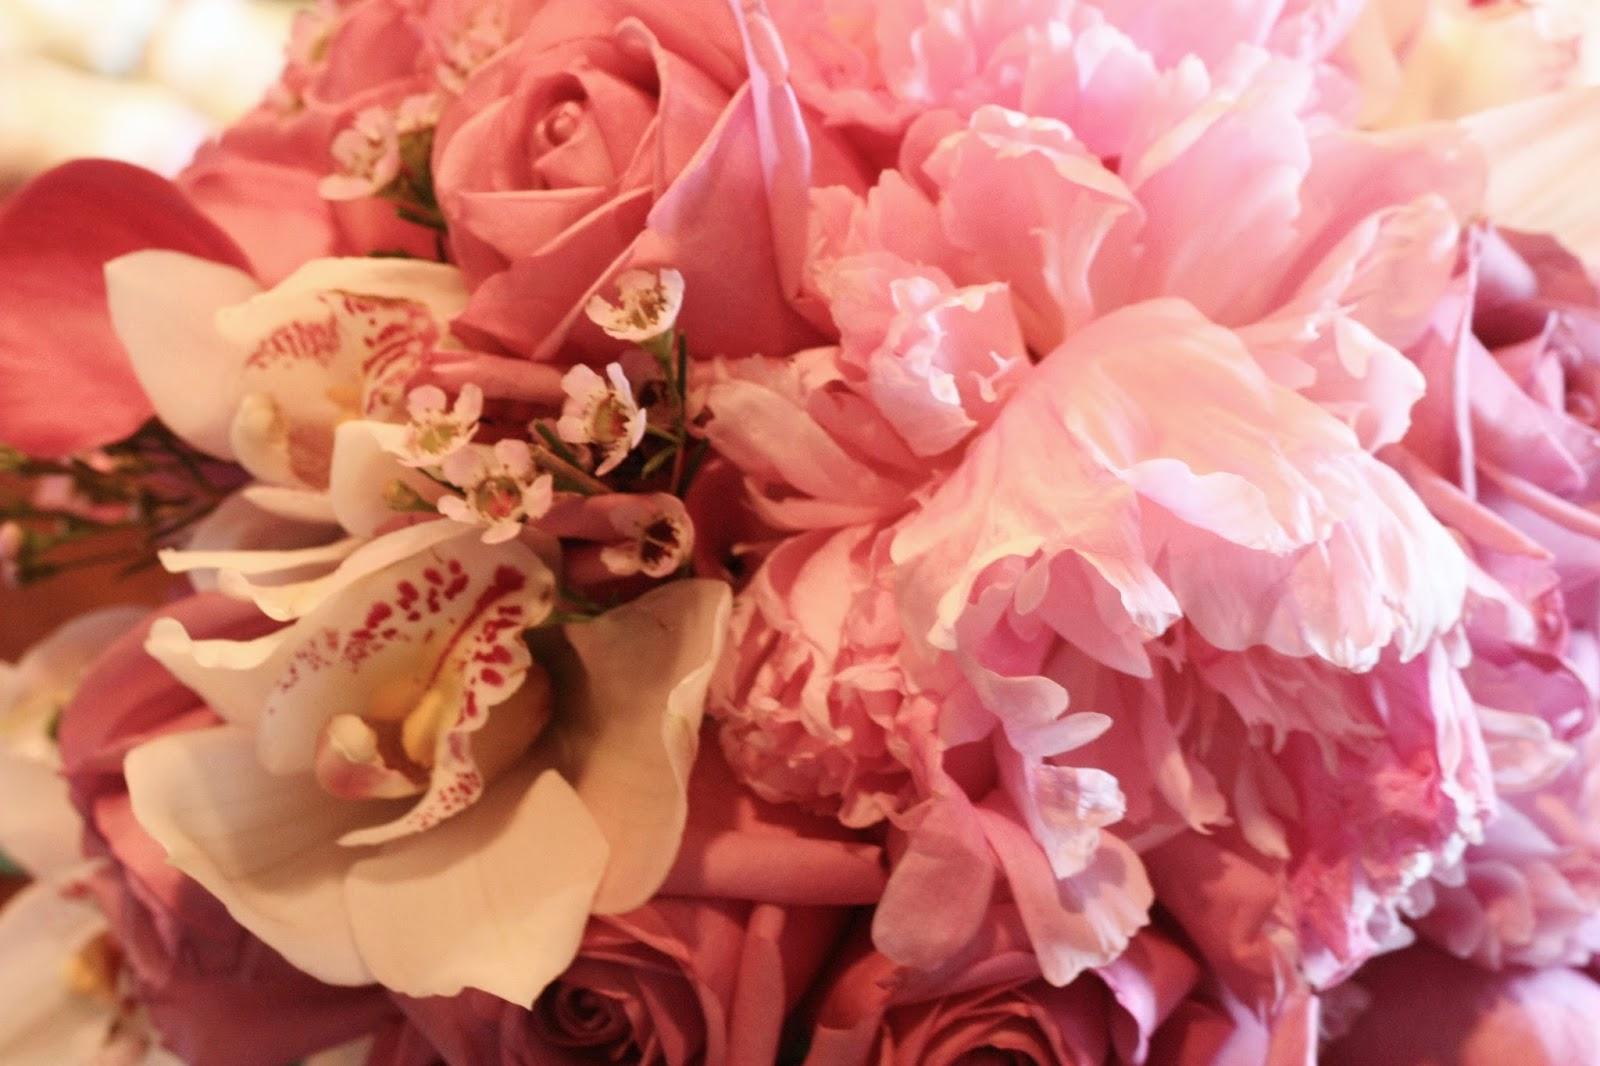 peonies, cymbidium, cool water roses, wax and calla lilies